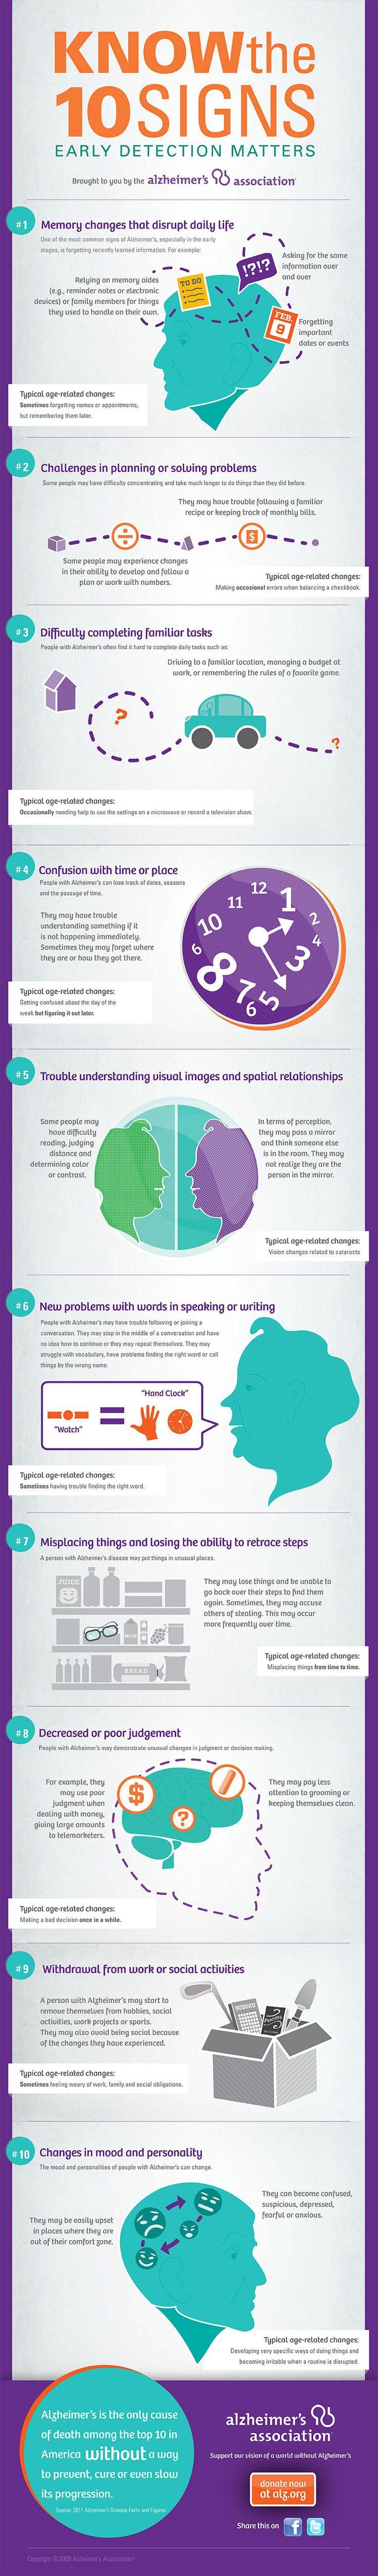 10 Signs Of #Alzheimers - via: @eppharmacy #mindcrowd #tgen www.mindcrowd.org